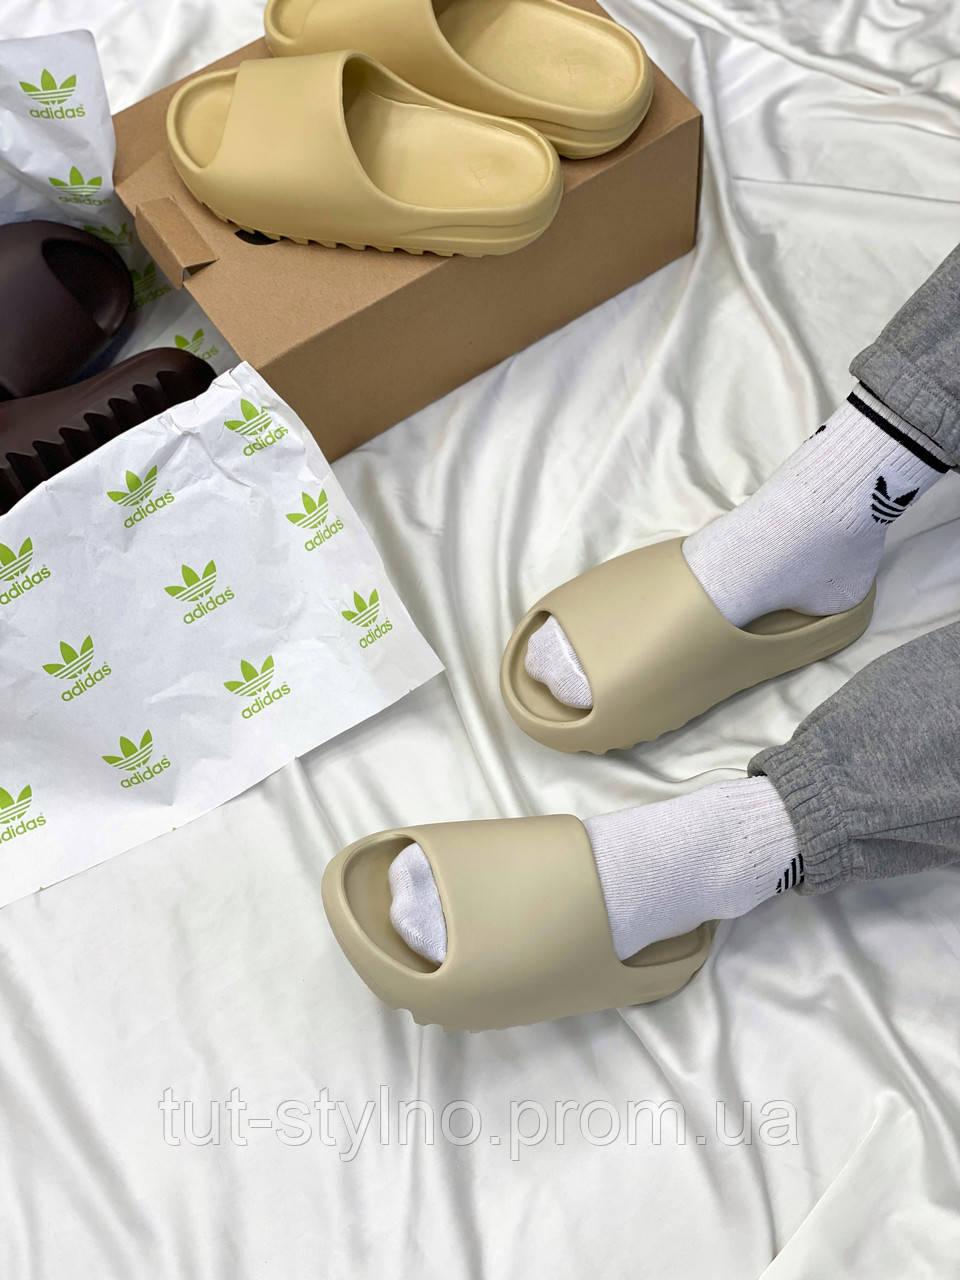 Adidas Yeezy Slide Bone (бежевые)